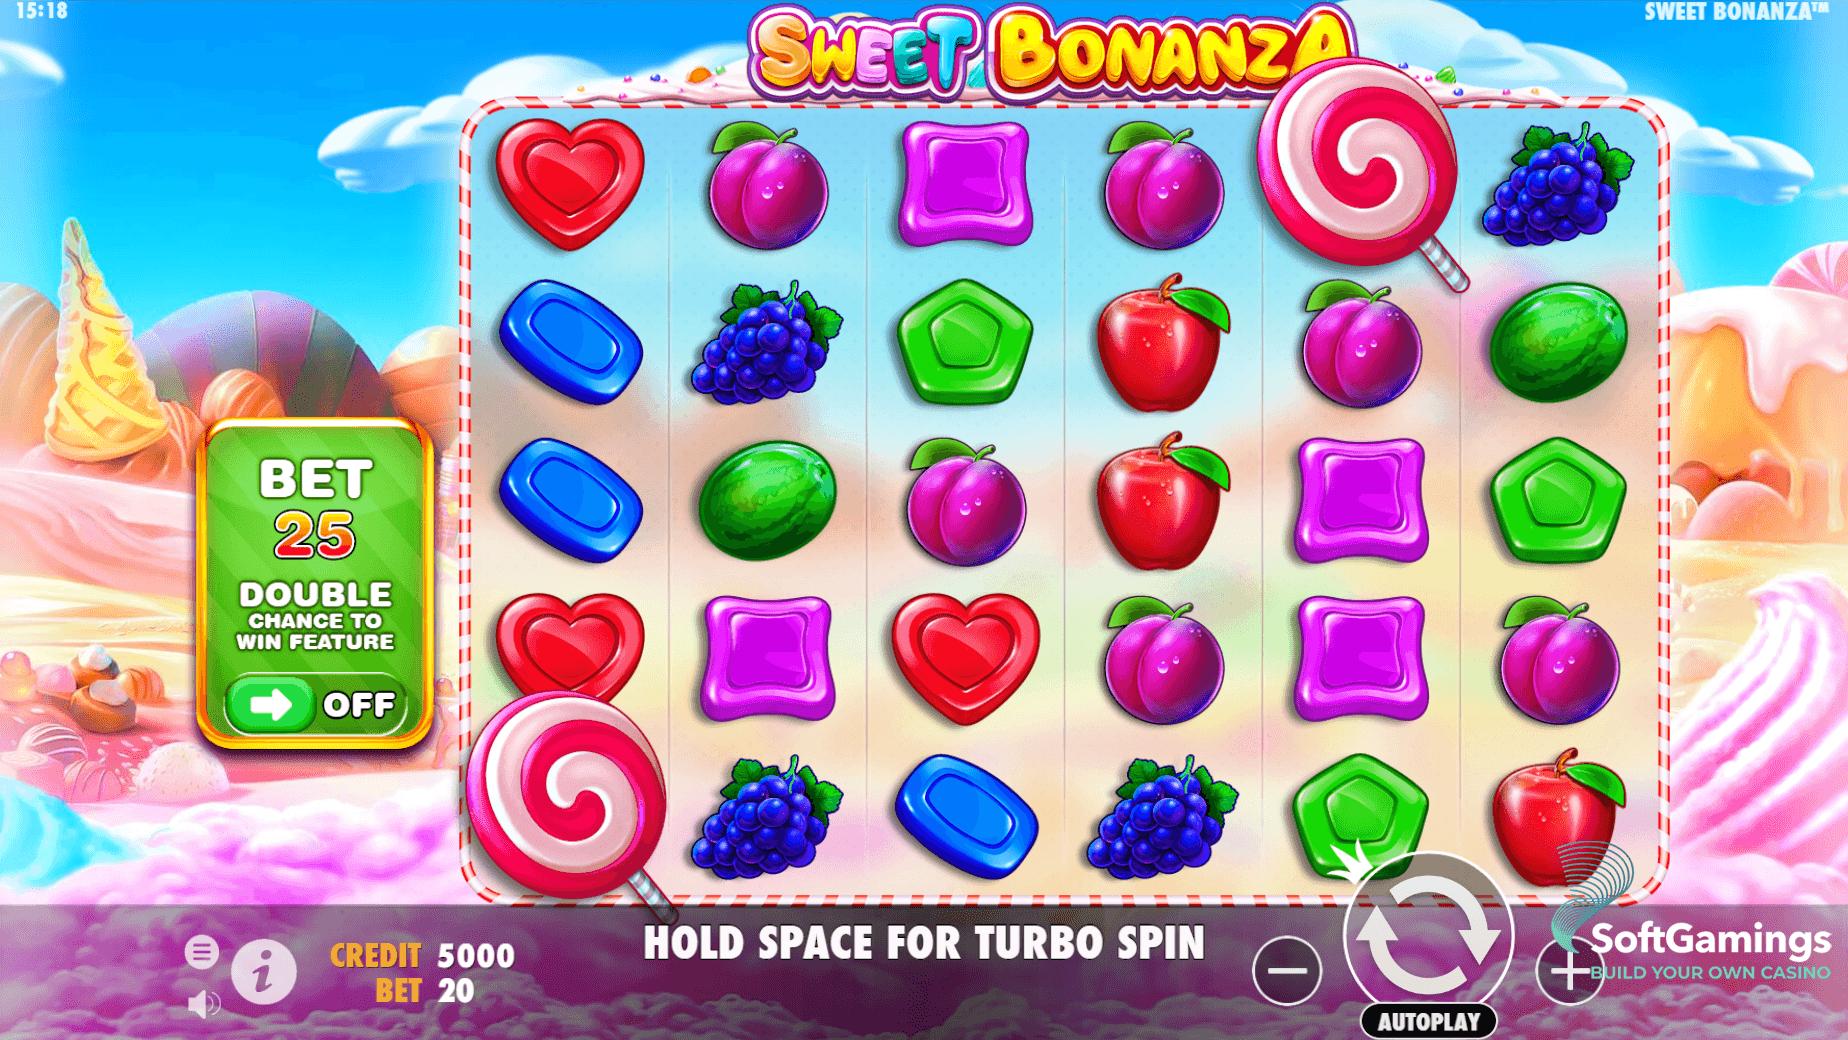 Sweet Bonanza - PragmaticPlay Games catalog | SoftGamings